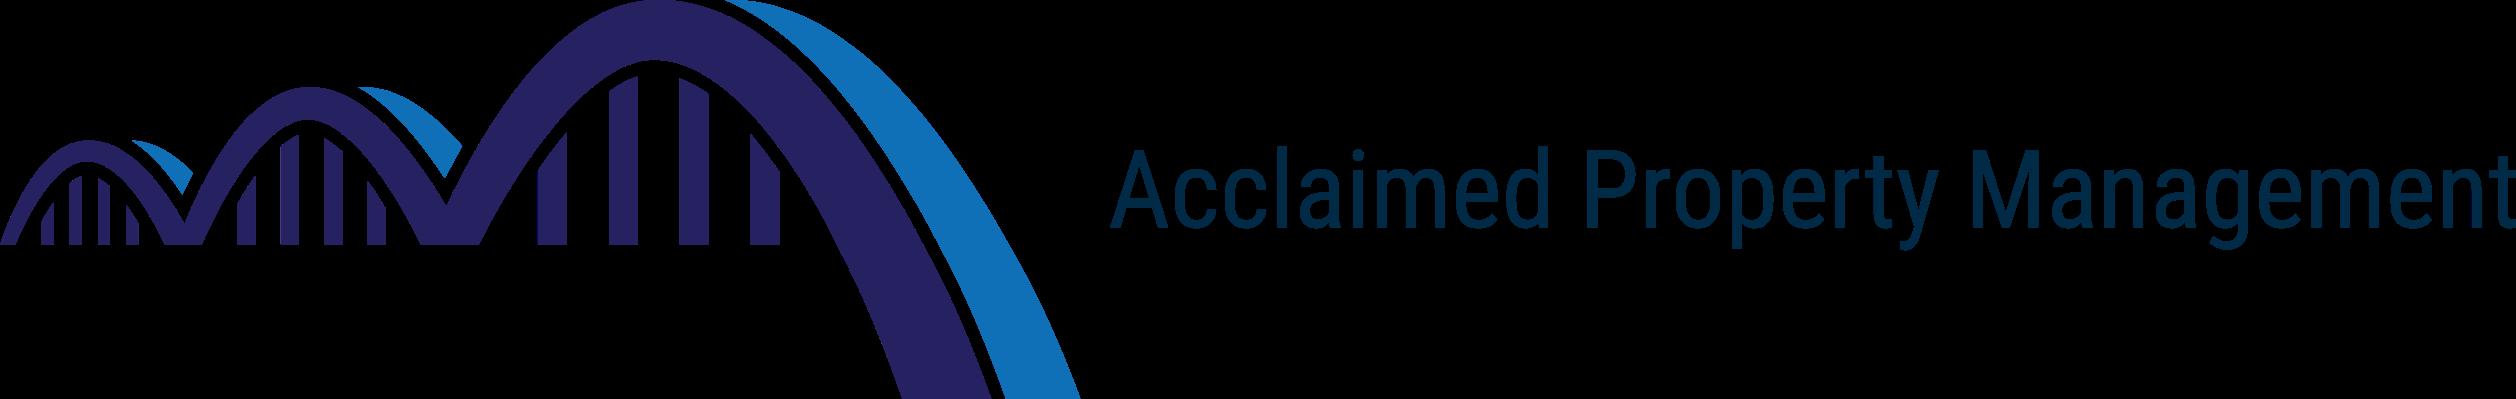 Acclaimed Property Management Inc